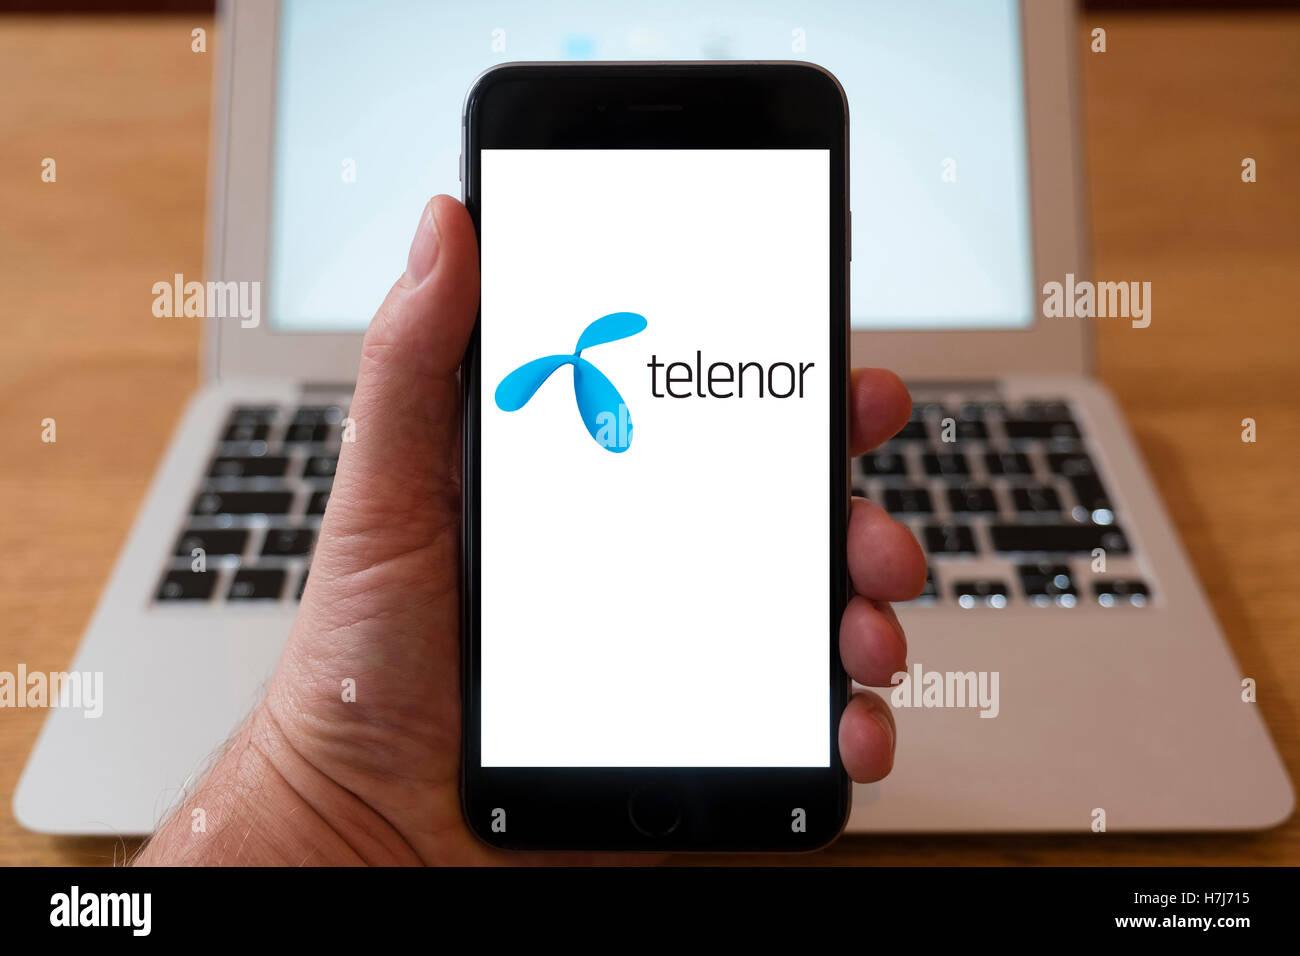 Using iPhone smartphone to display logo of Telenor , Norwegian multinational telecommunications company headquartered - Stock Image